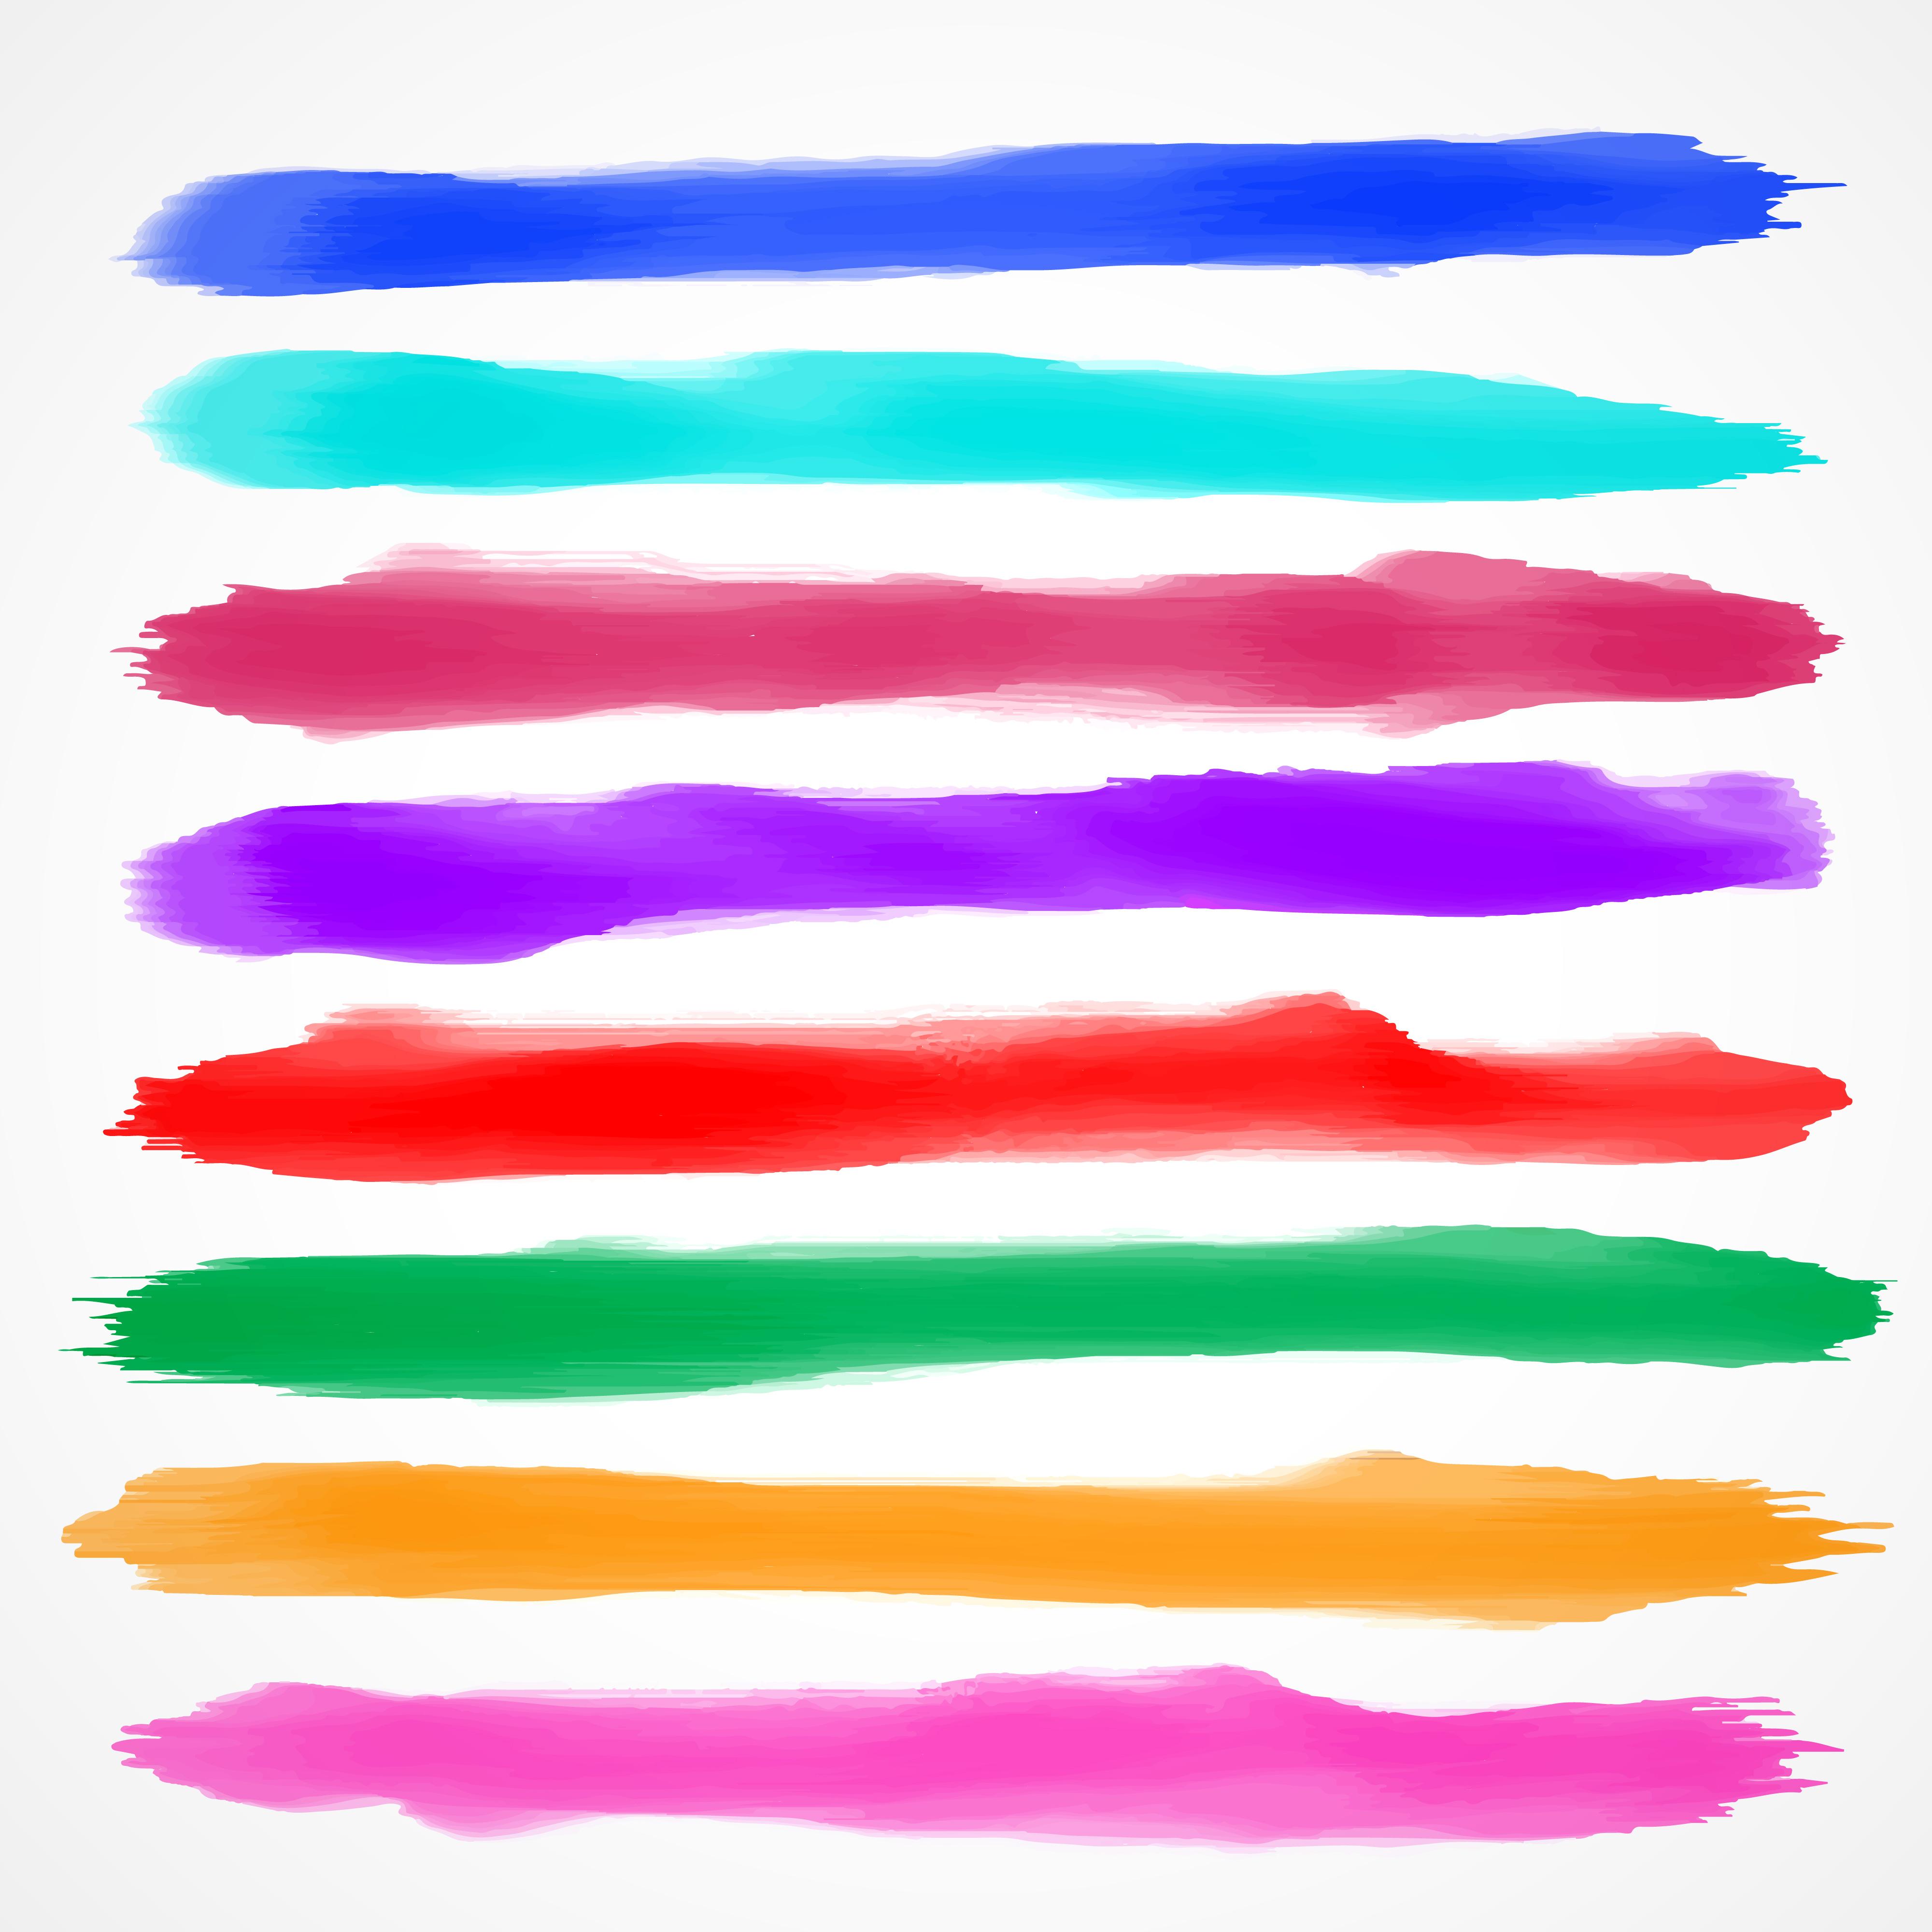 Watercolor Brush Strokes Free Vector Art 4589 Free